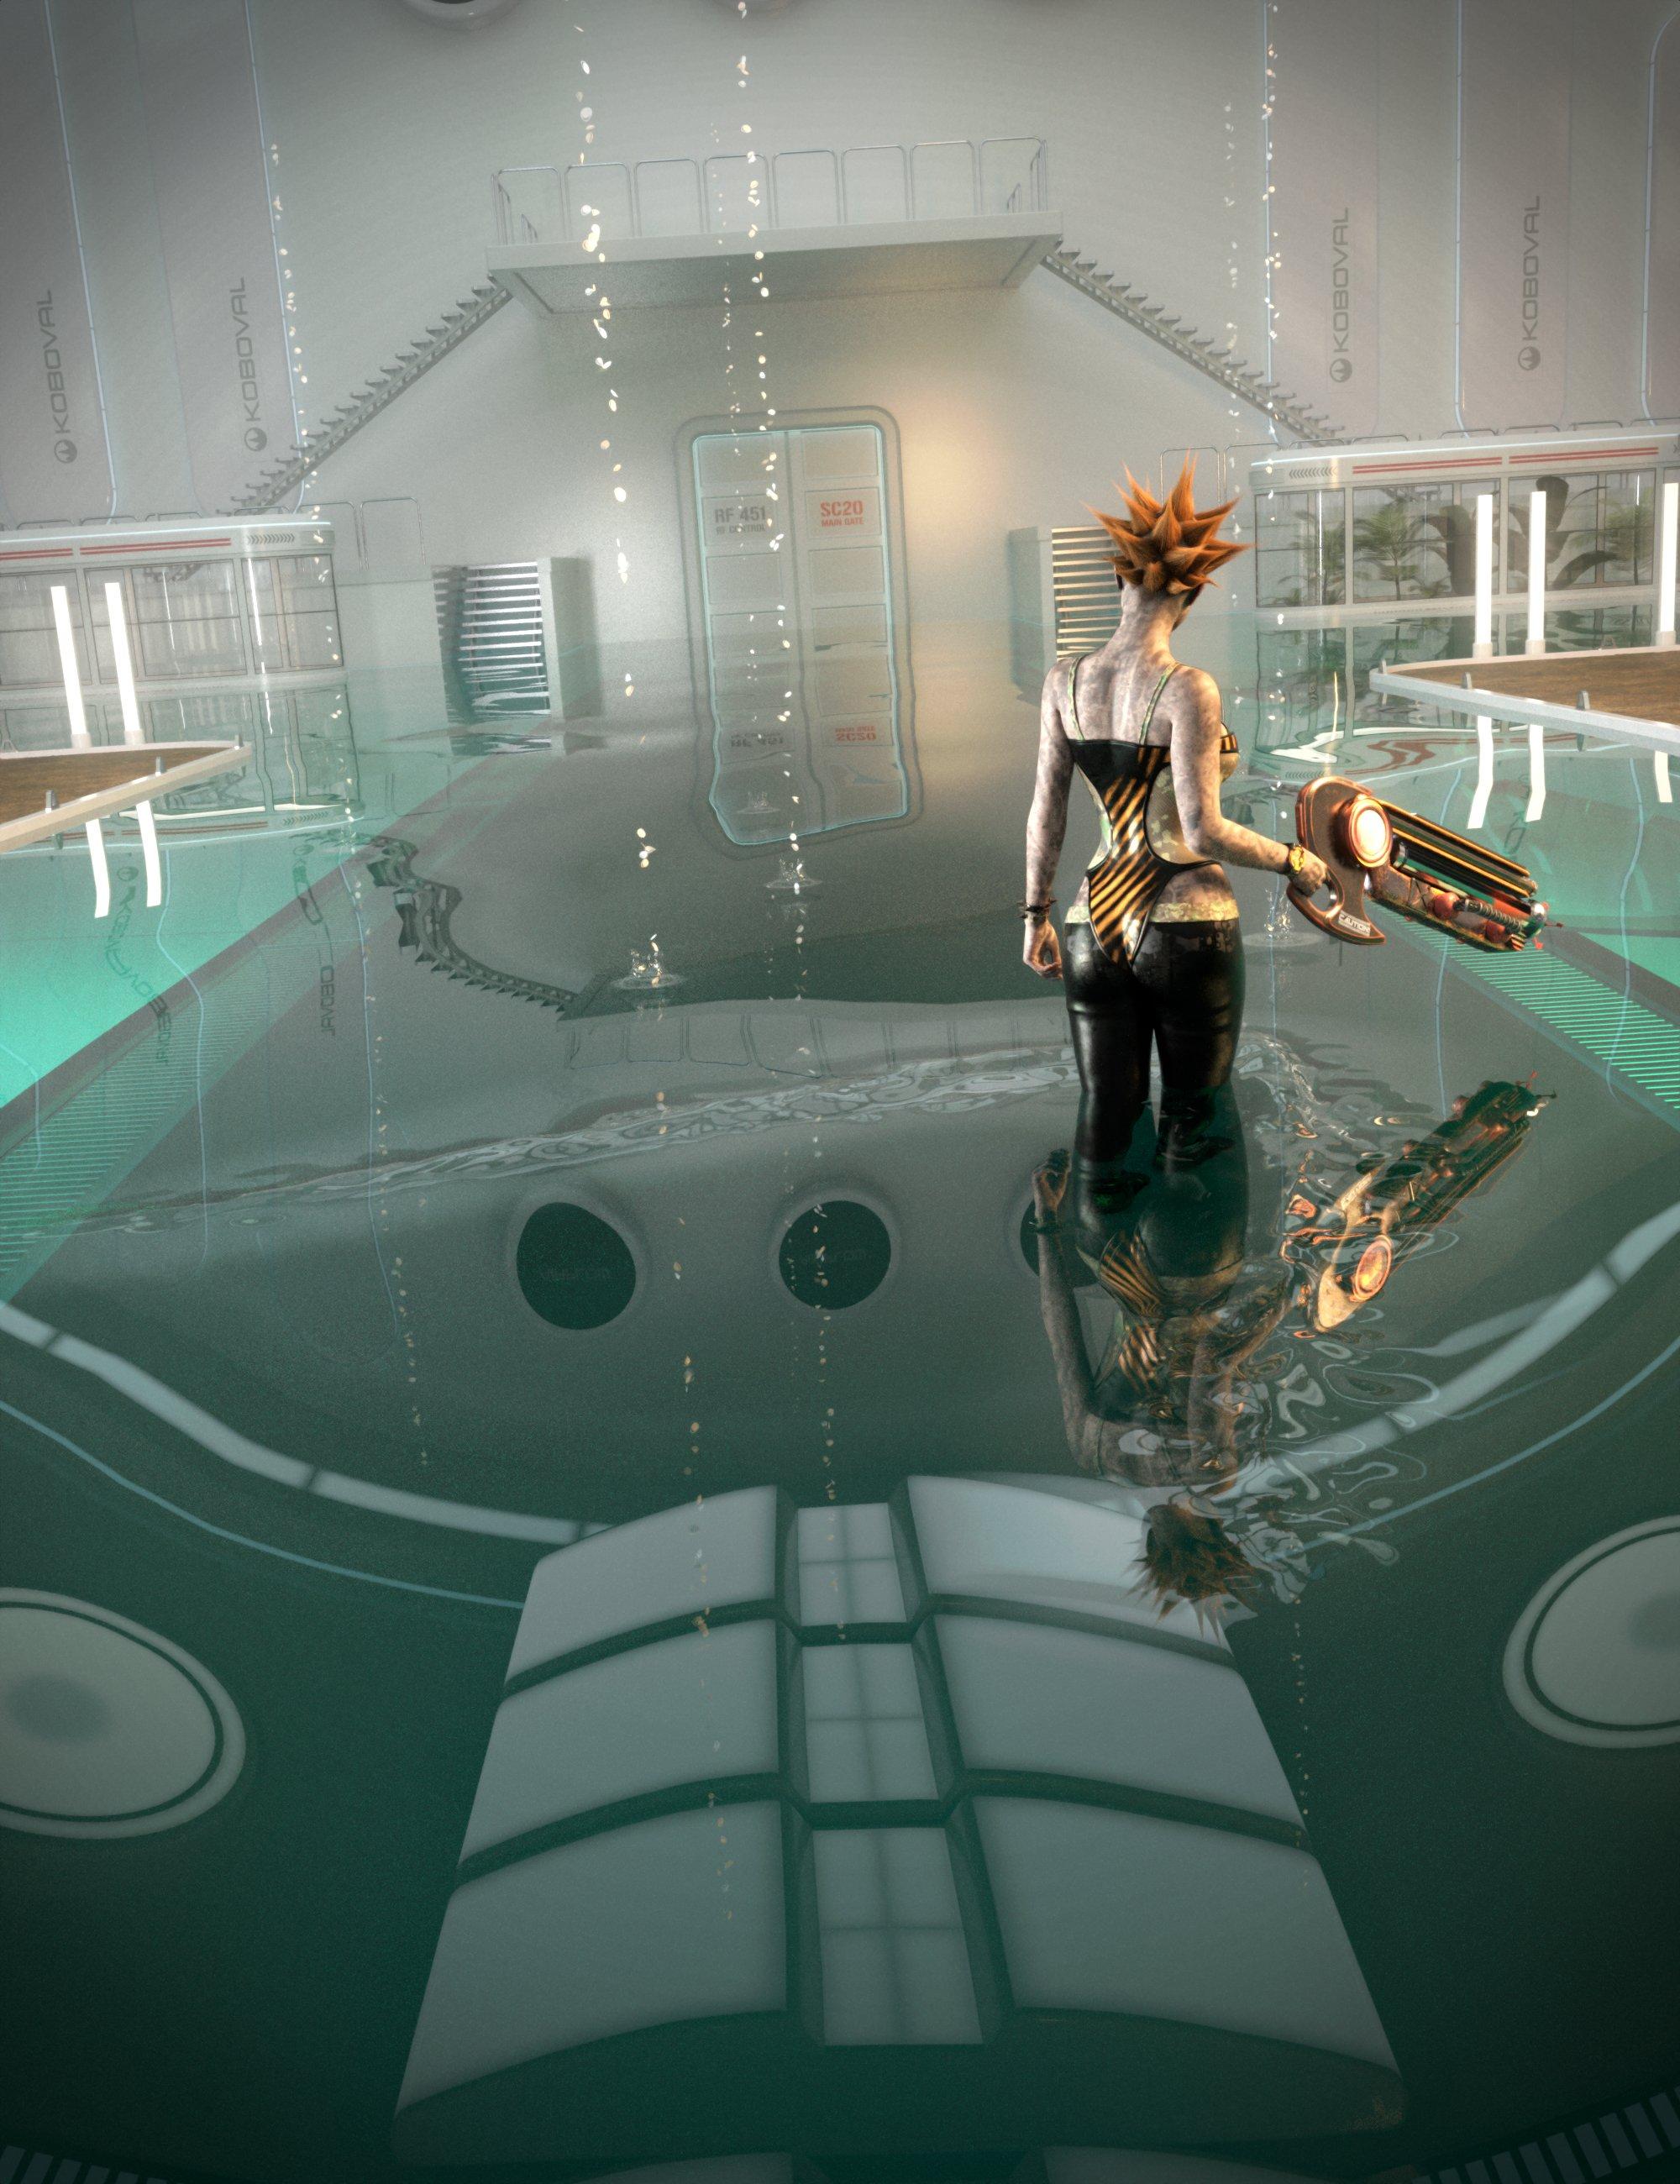 SY Rippling Water Iray by: Sickleyield, 3D Models by Daz 3D